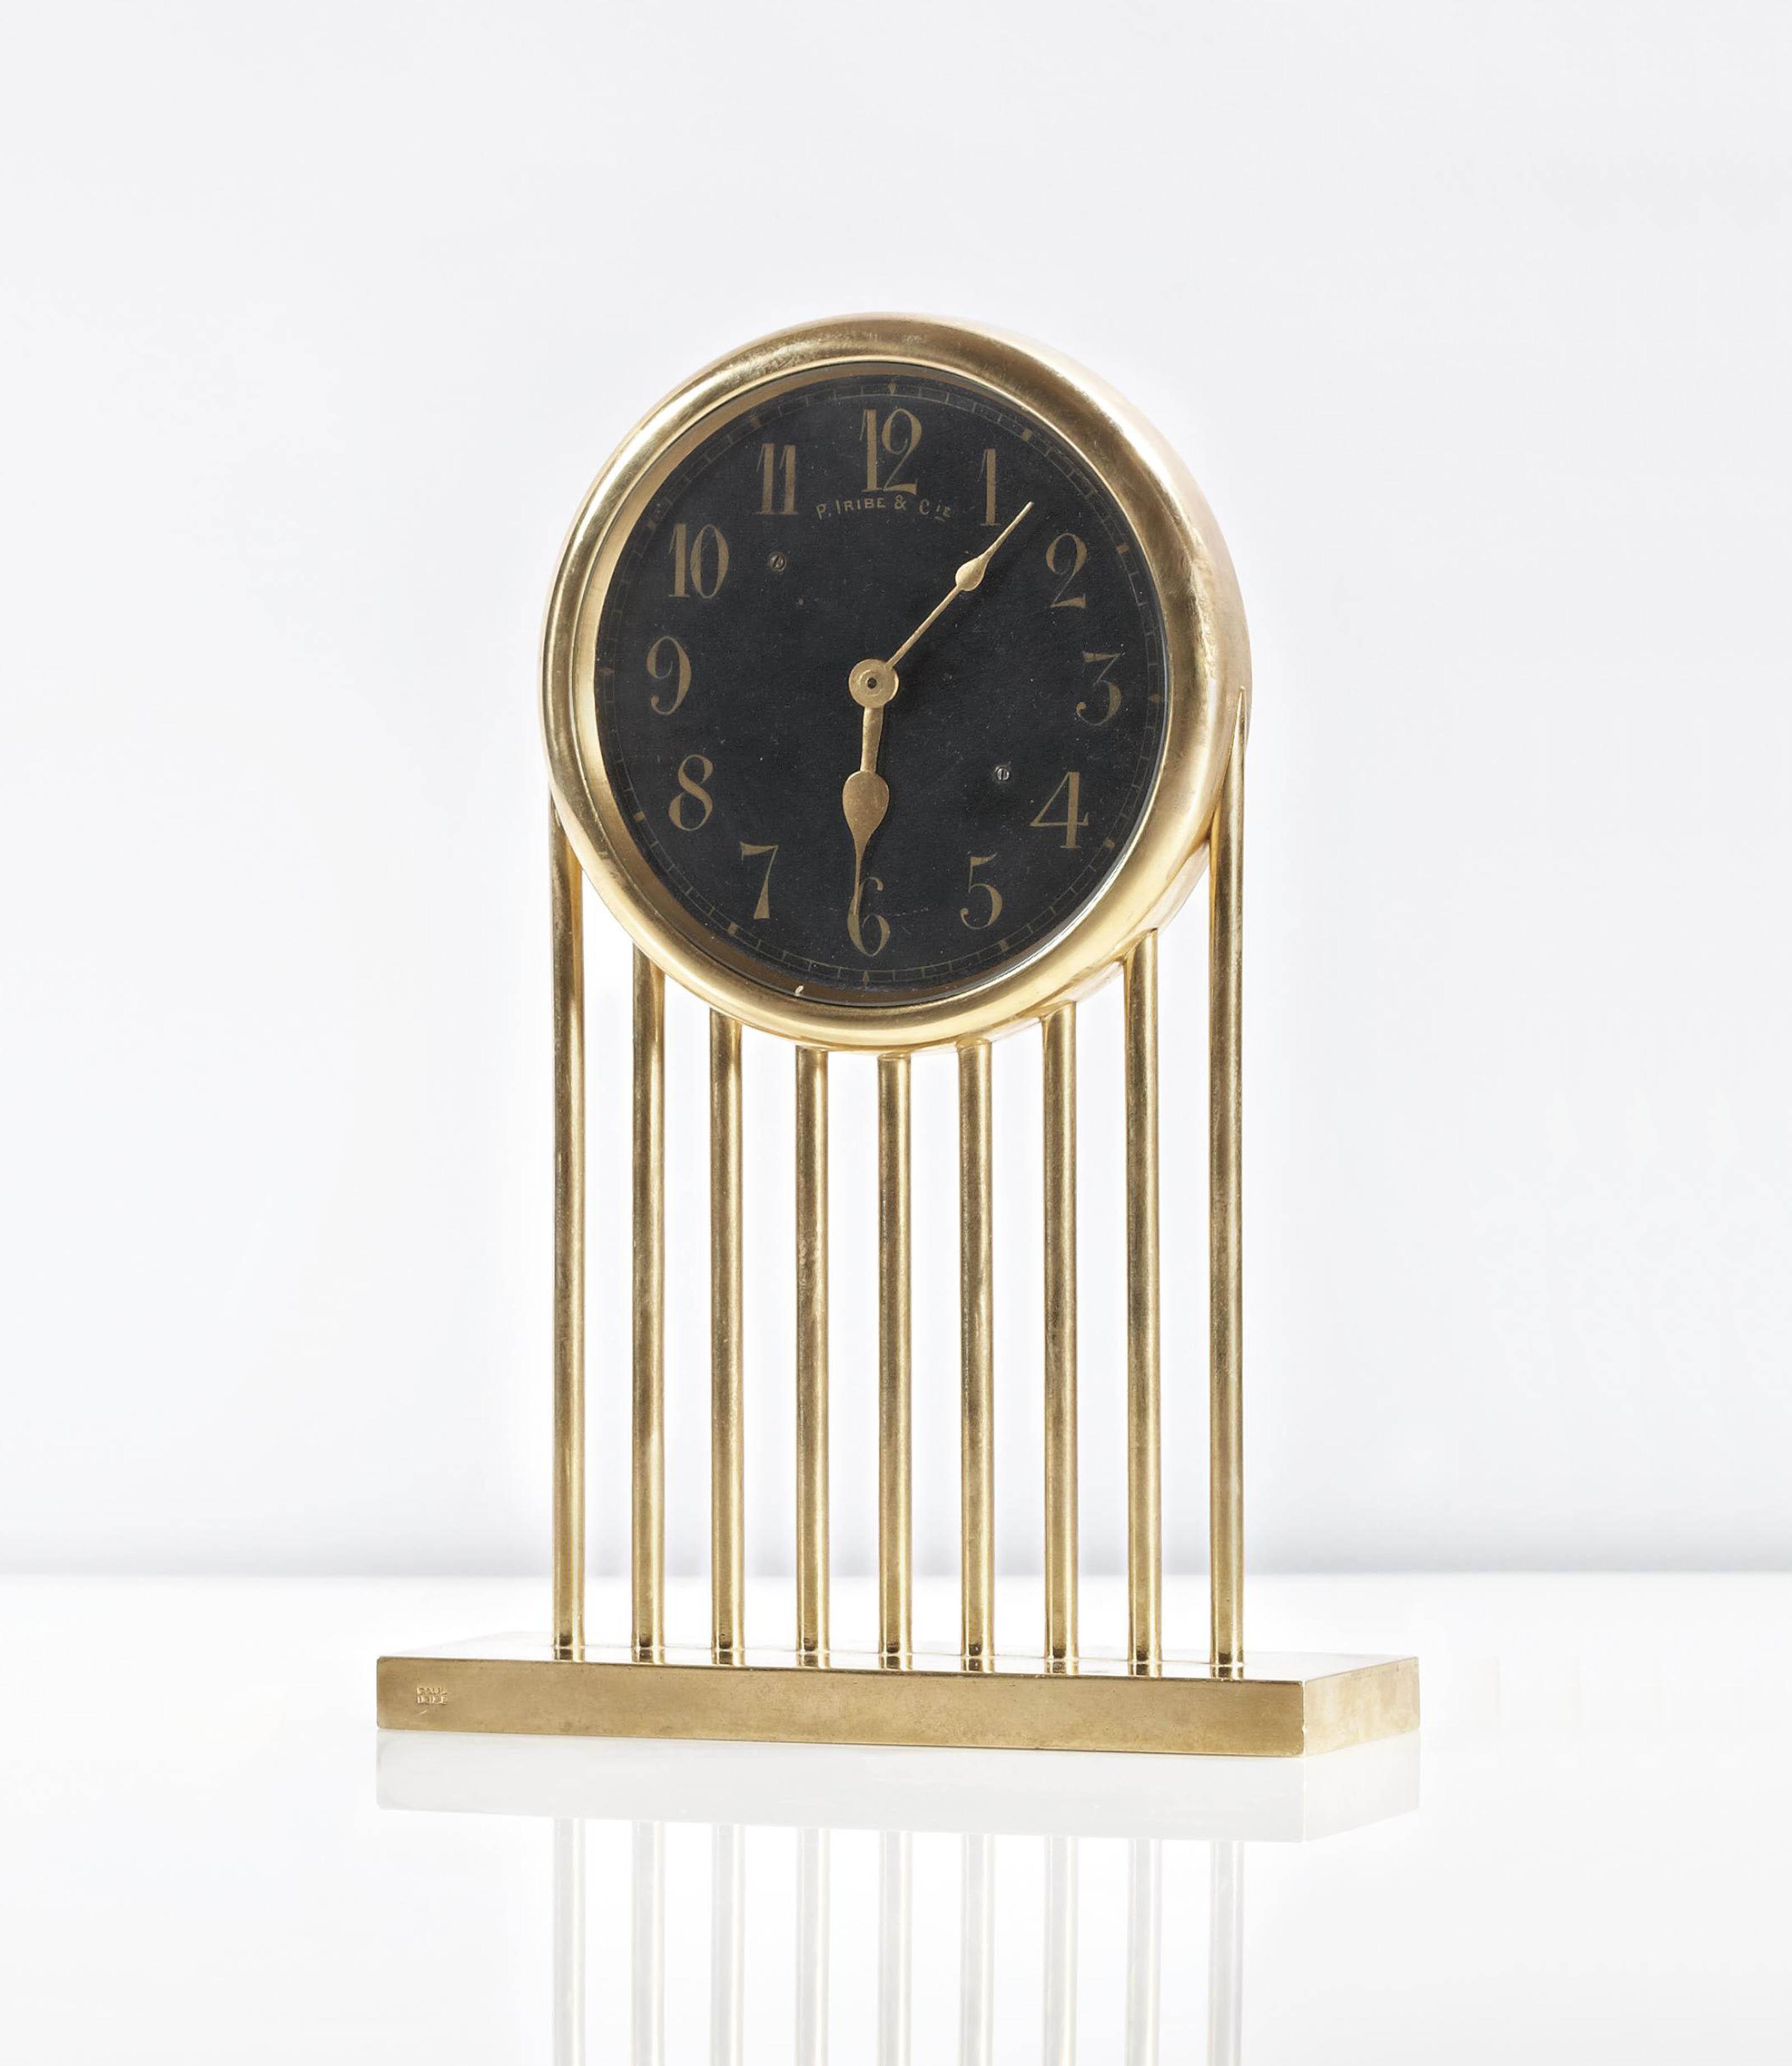 paul iribe horloge art deco